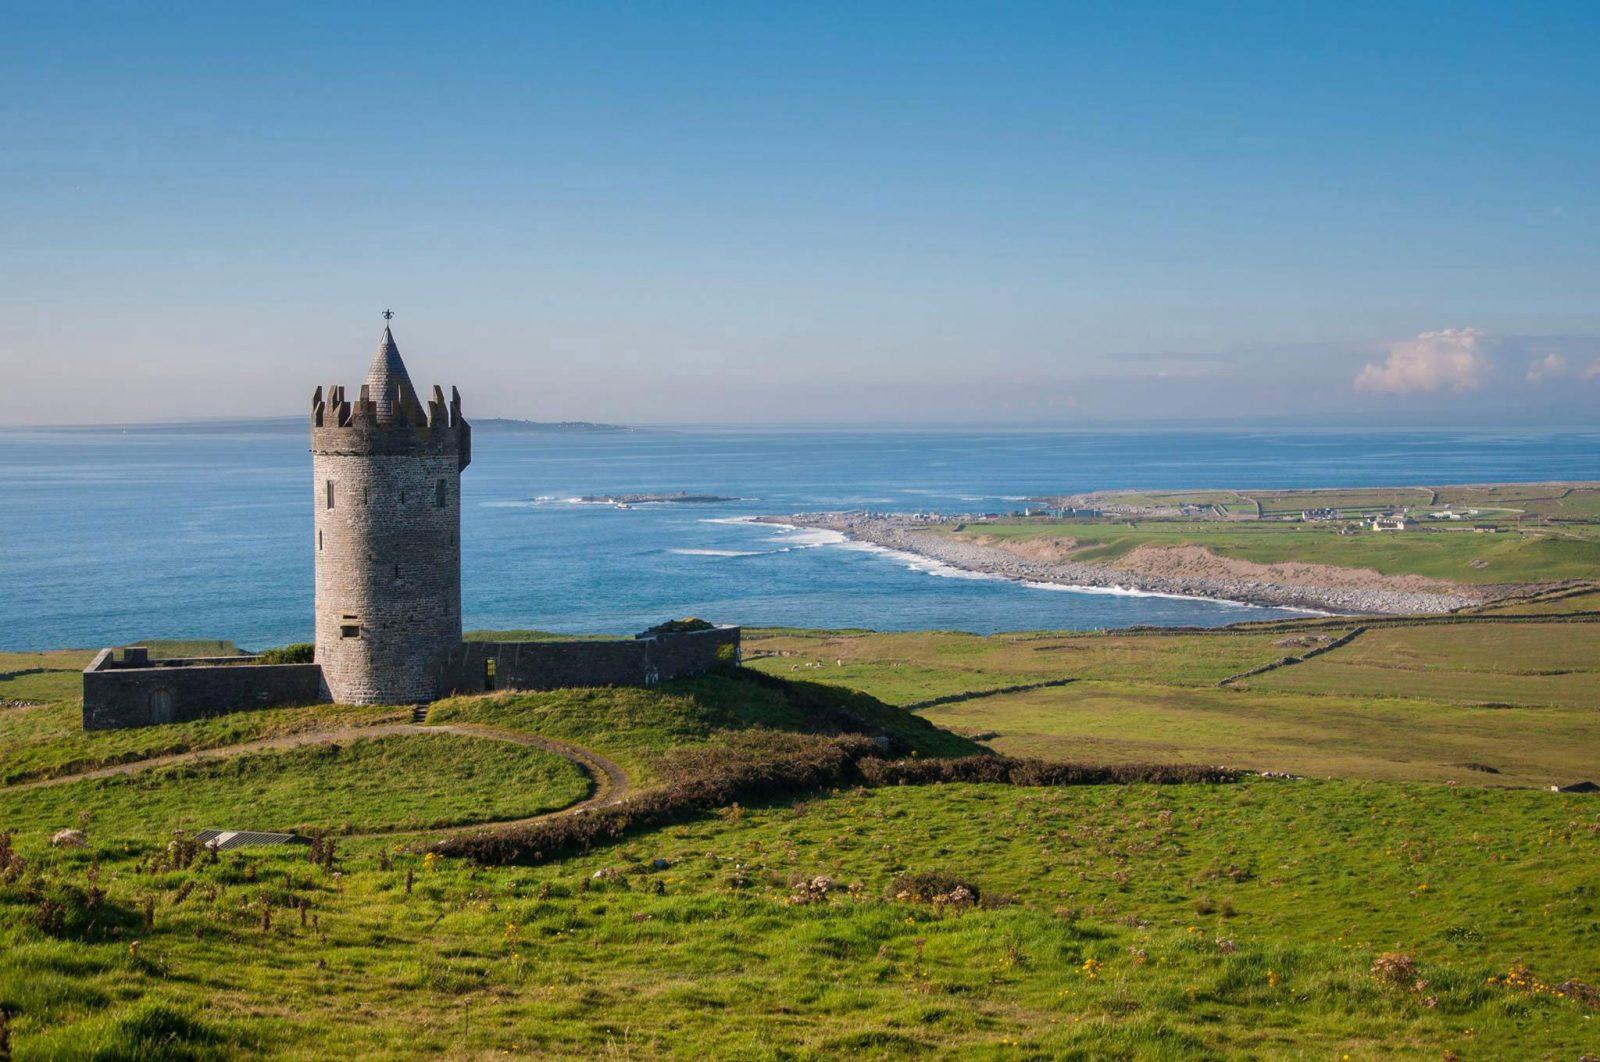 Doonagore Castle - doolin - viaggio in irlanda - on the road irlanda - istanti in viaggio